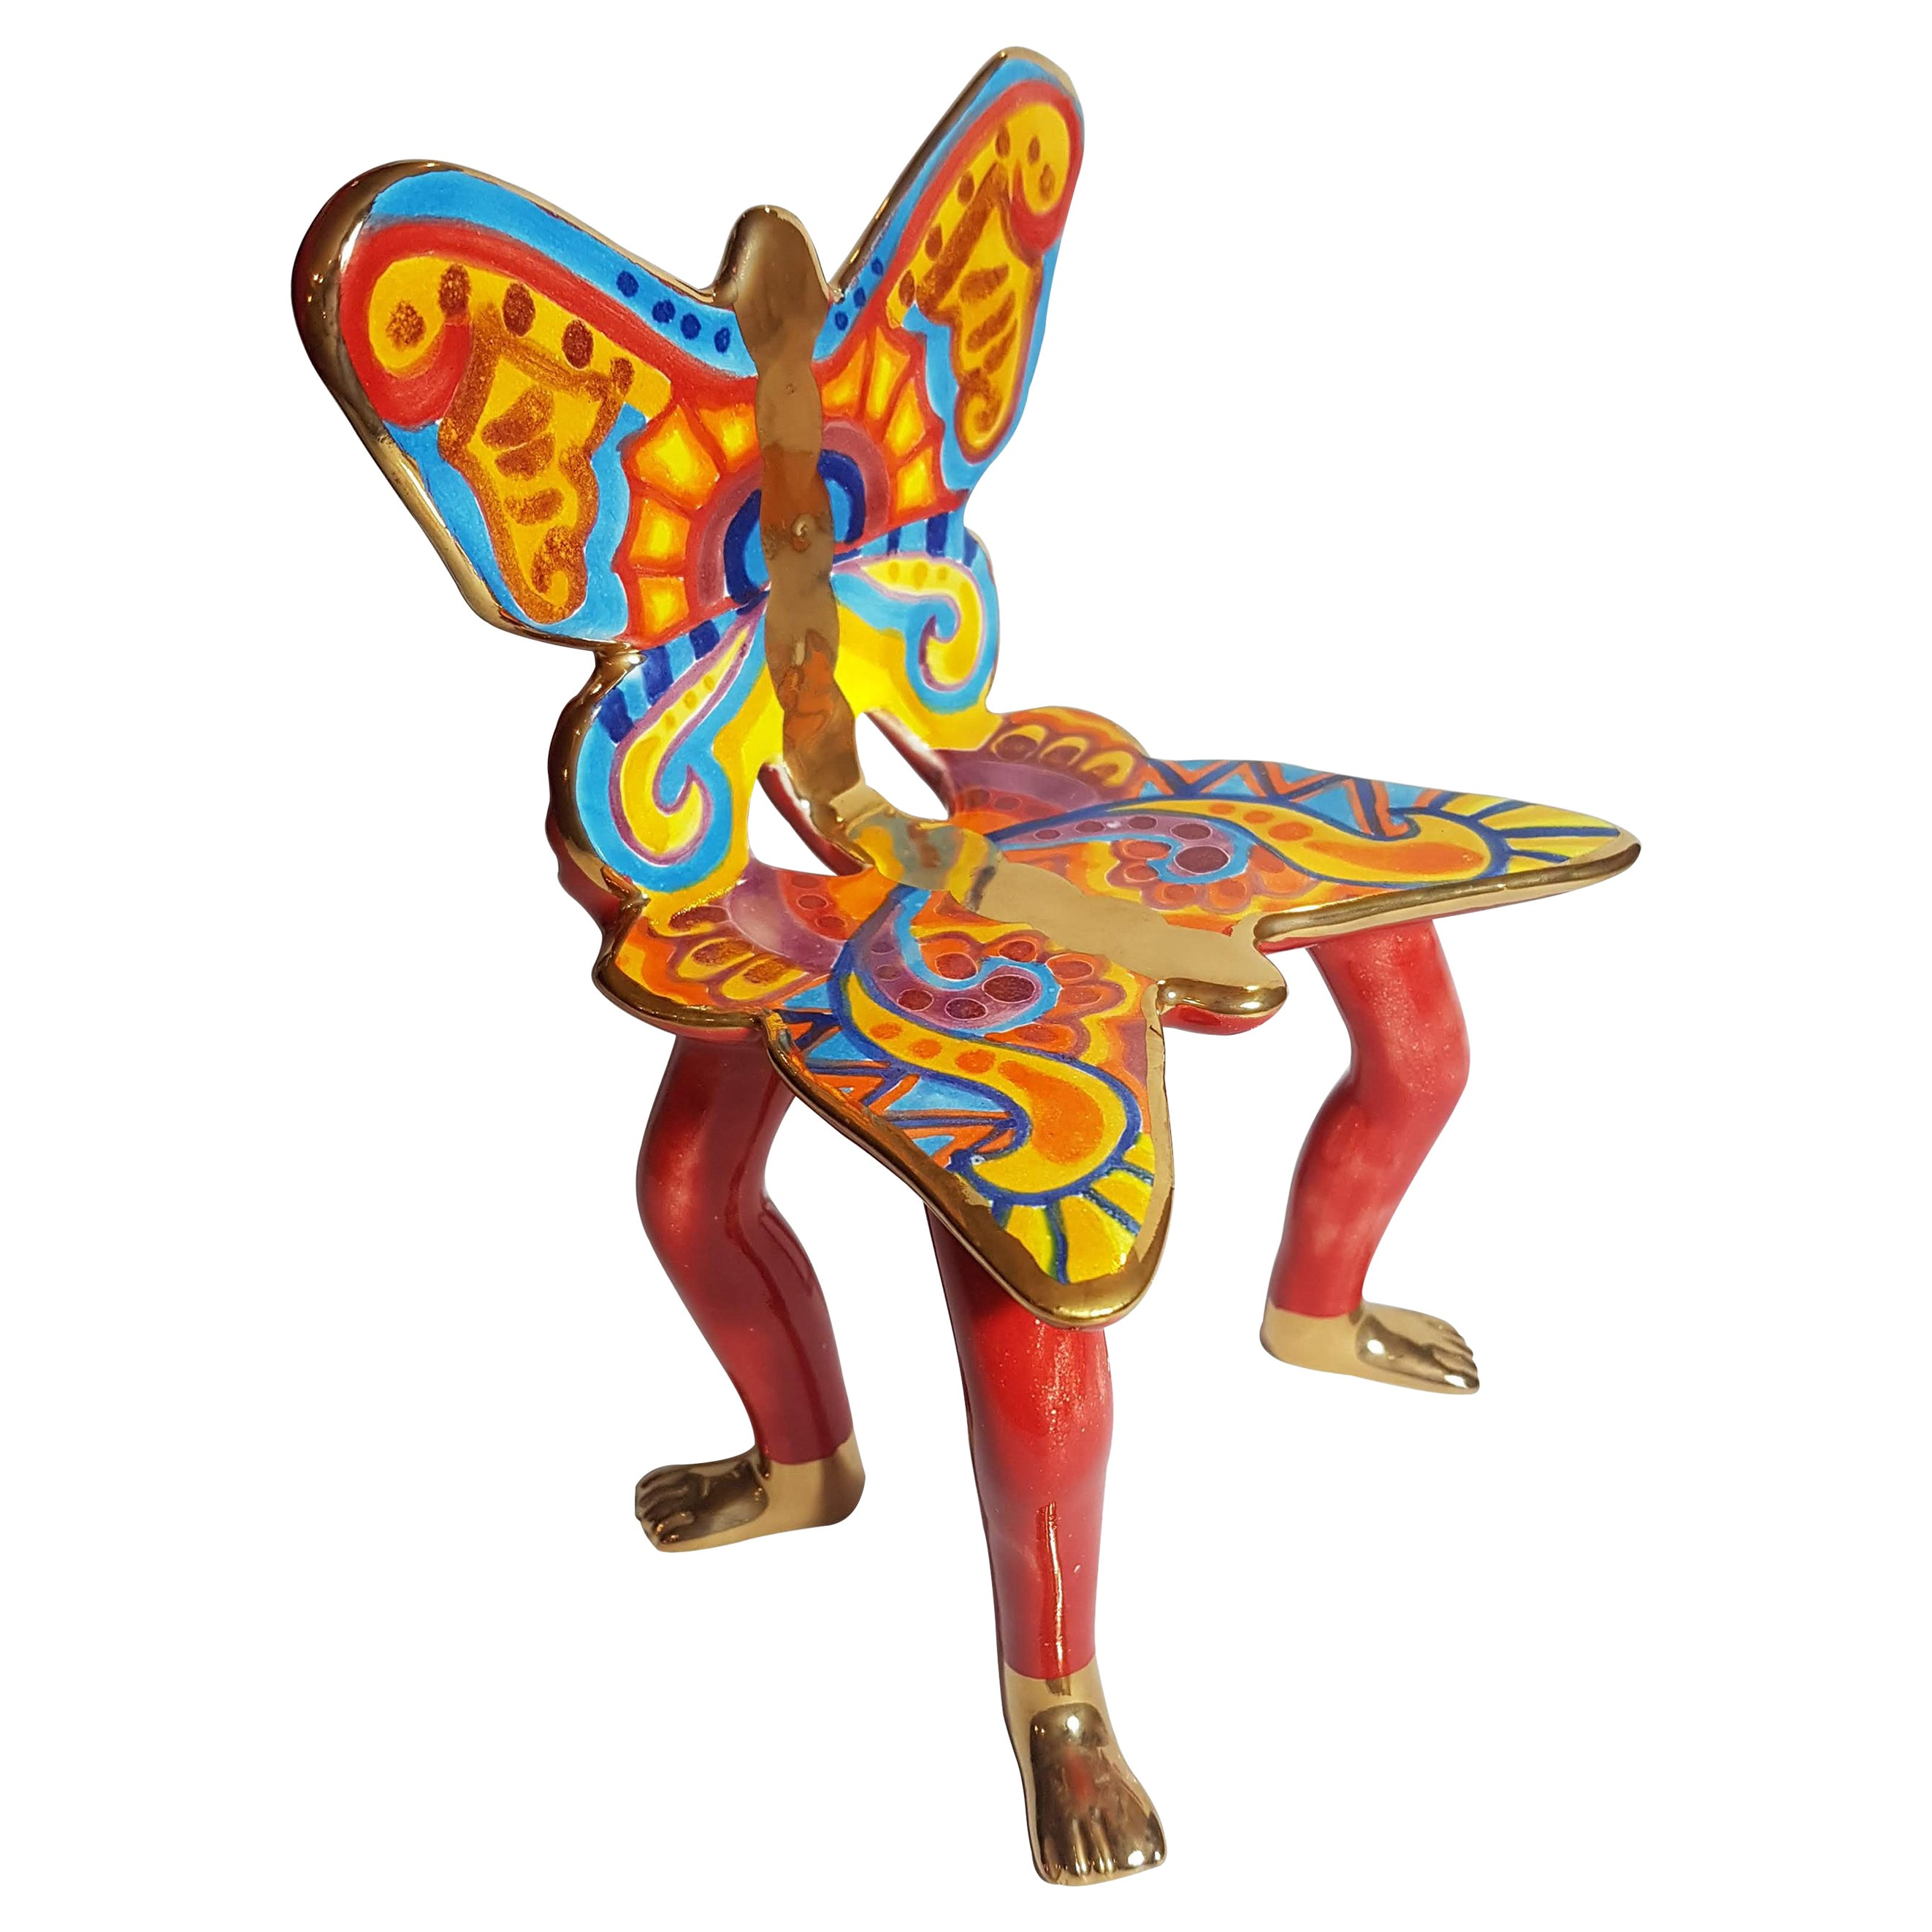 Pedro Friedeberg Ceramic Butterfly Chair Sculpture